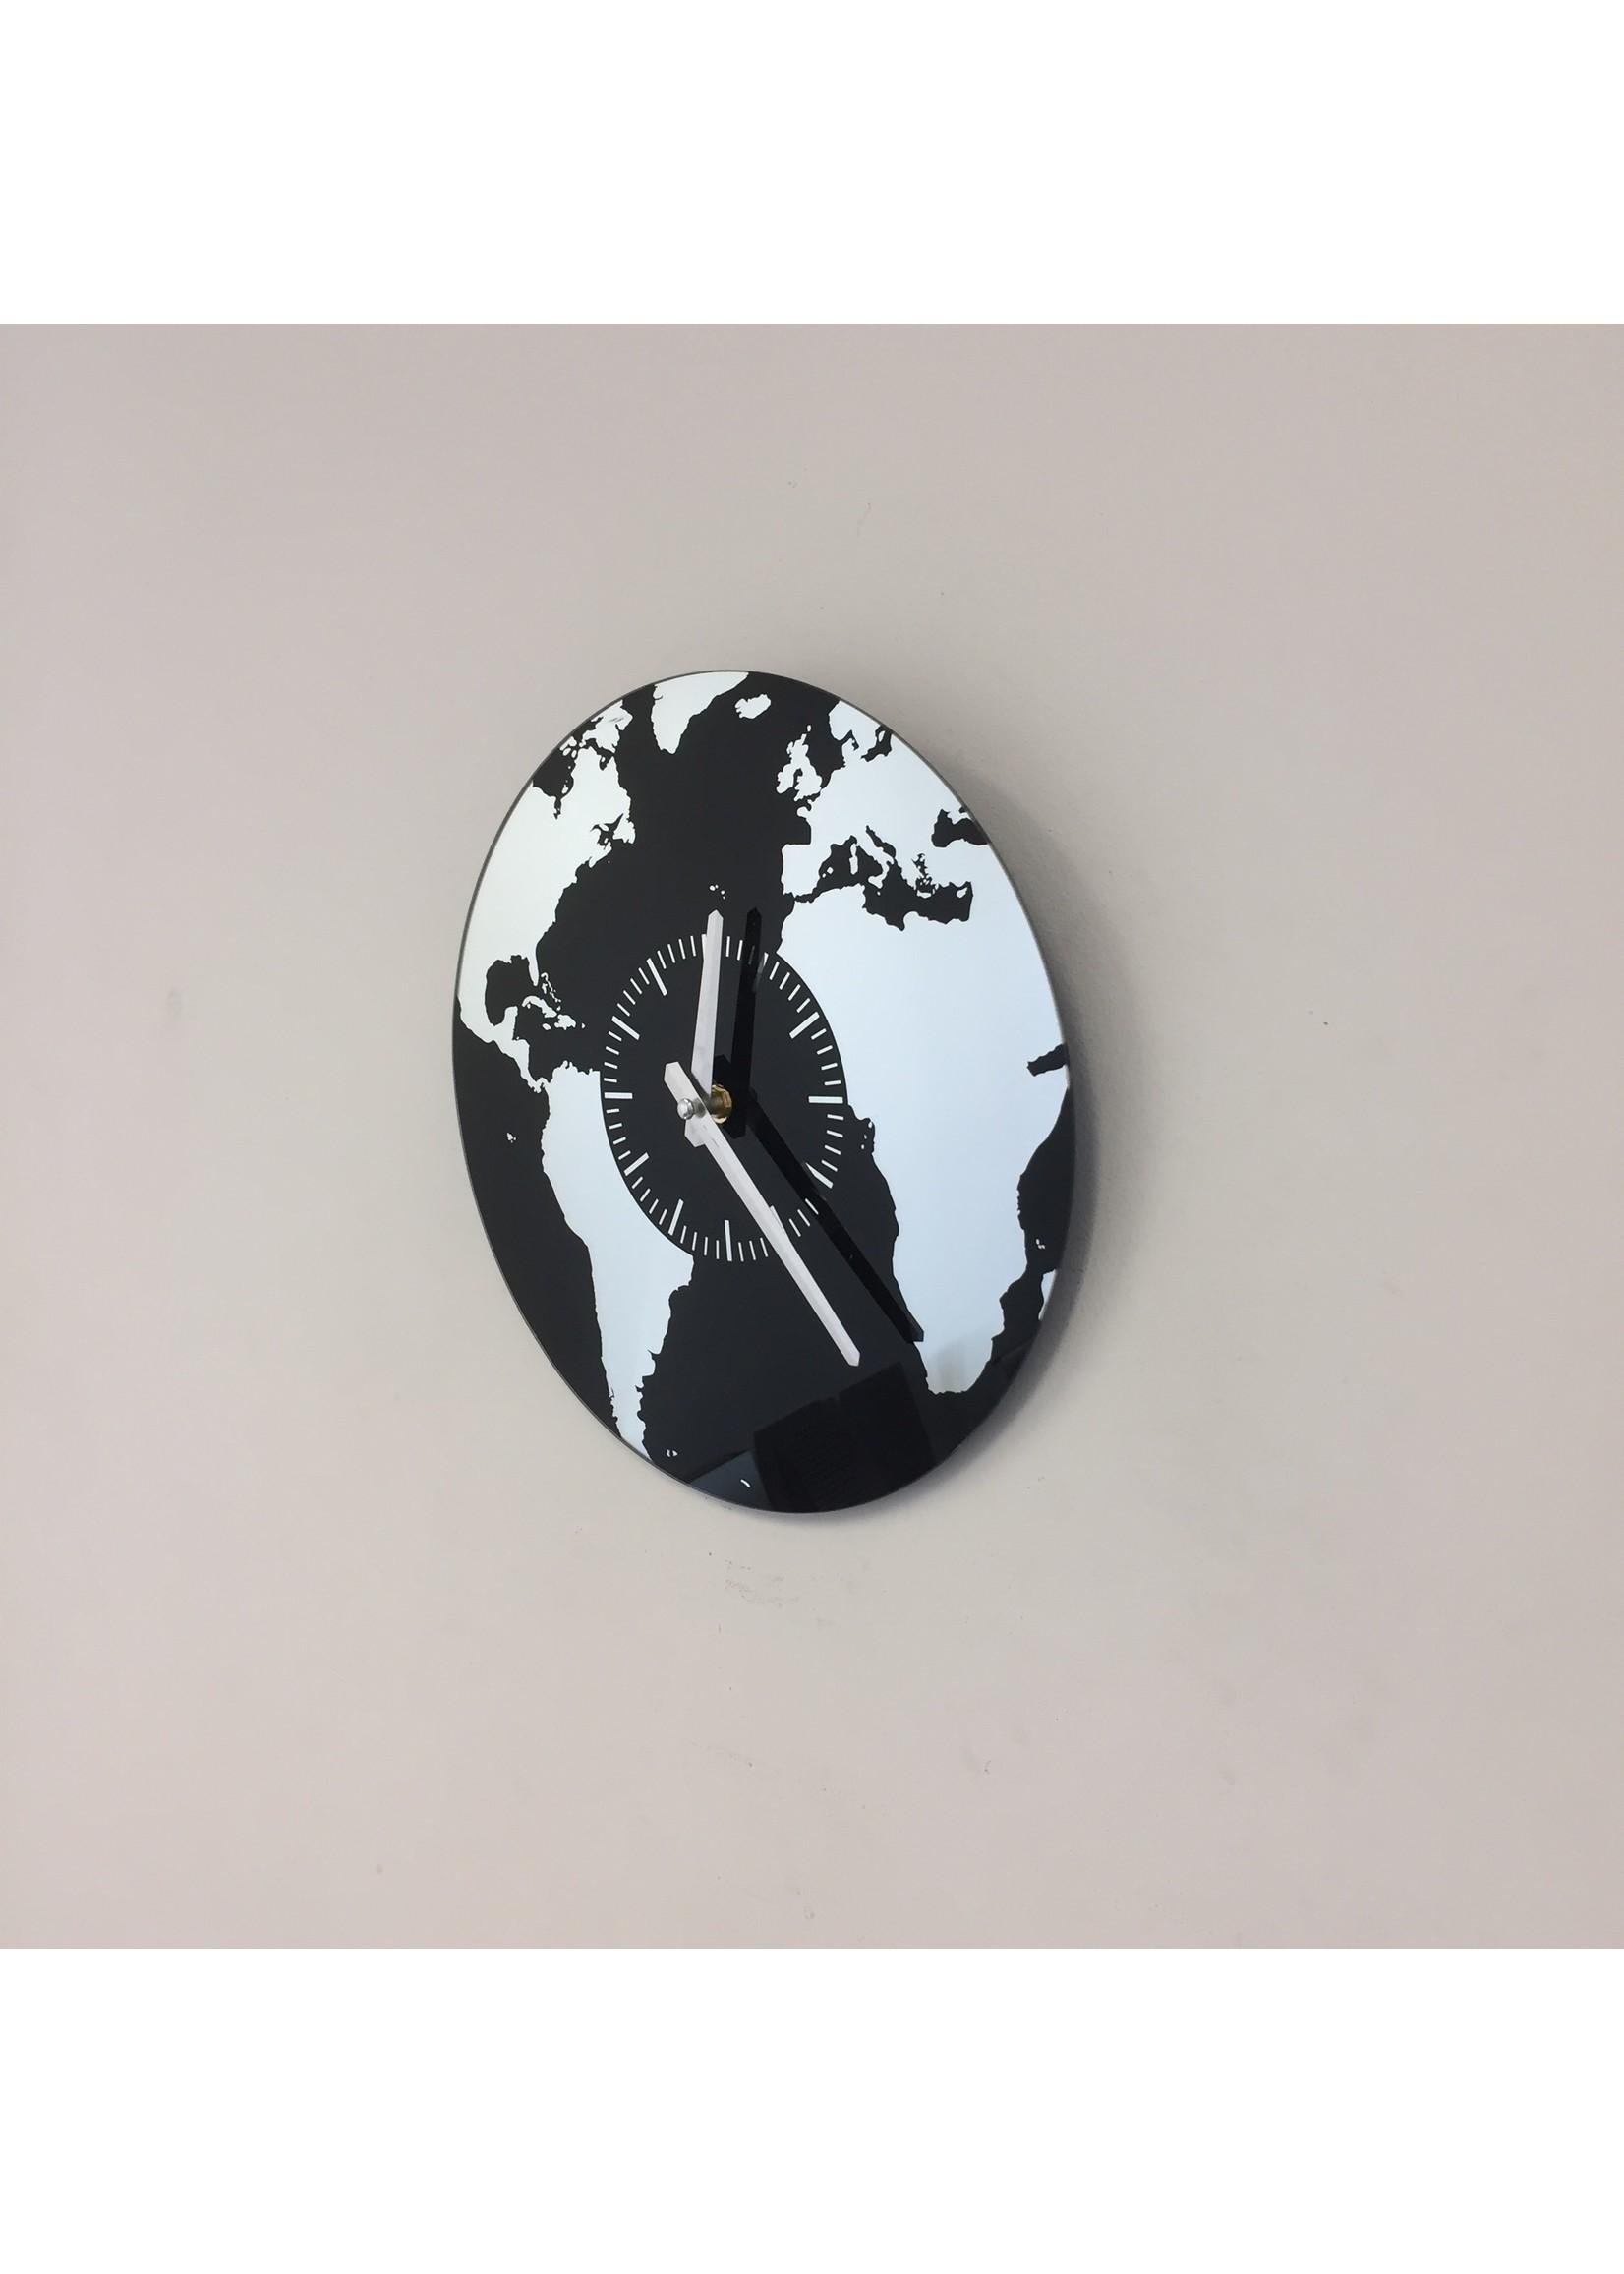 Wandklok Planet Earth modern design